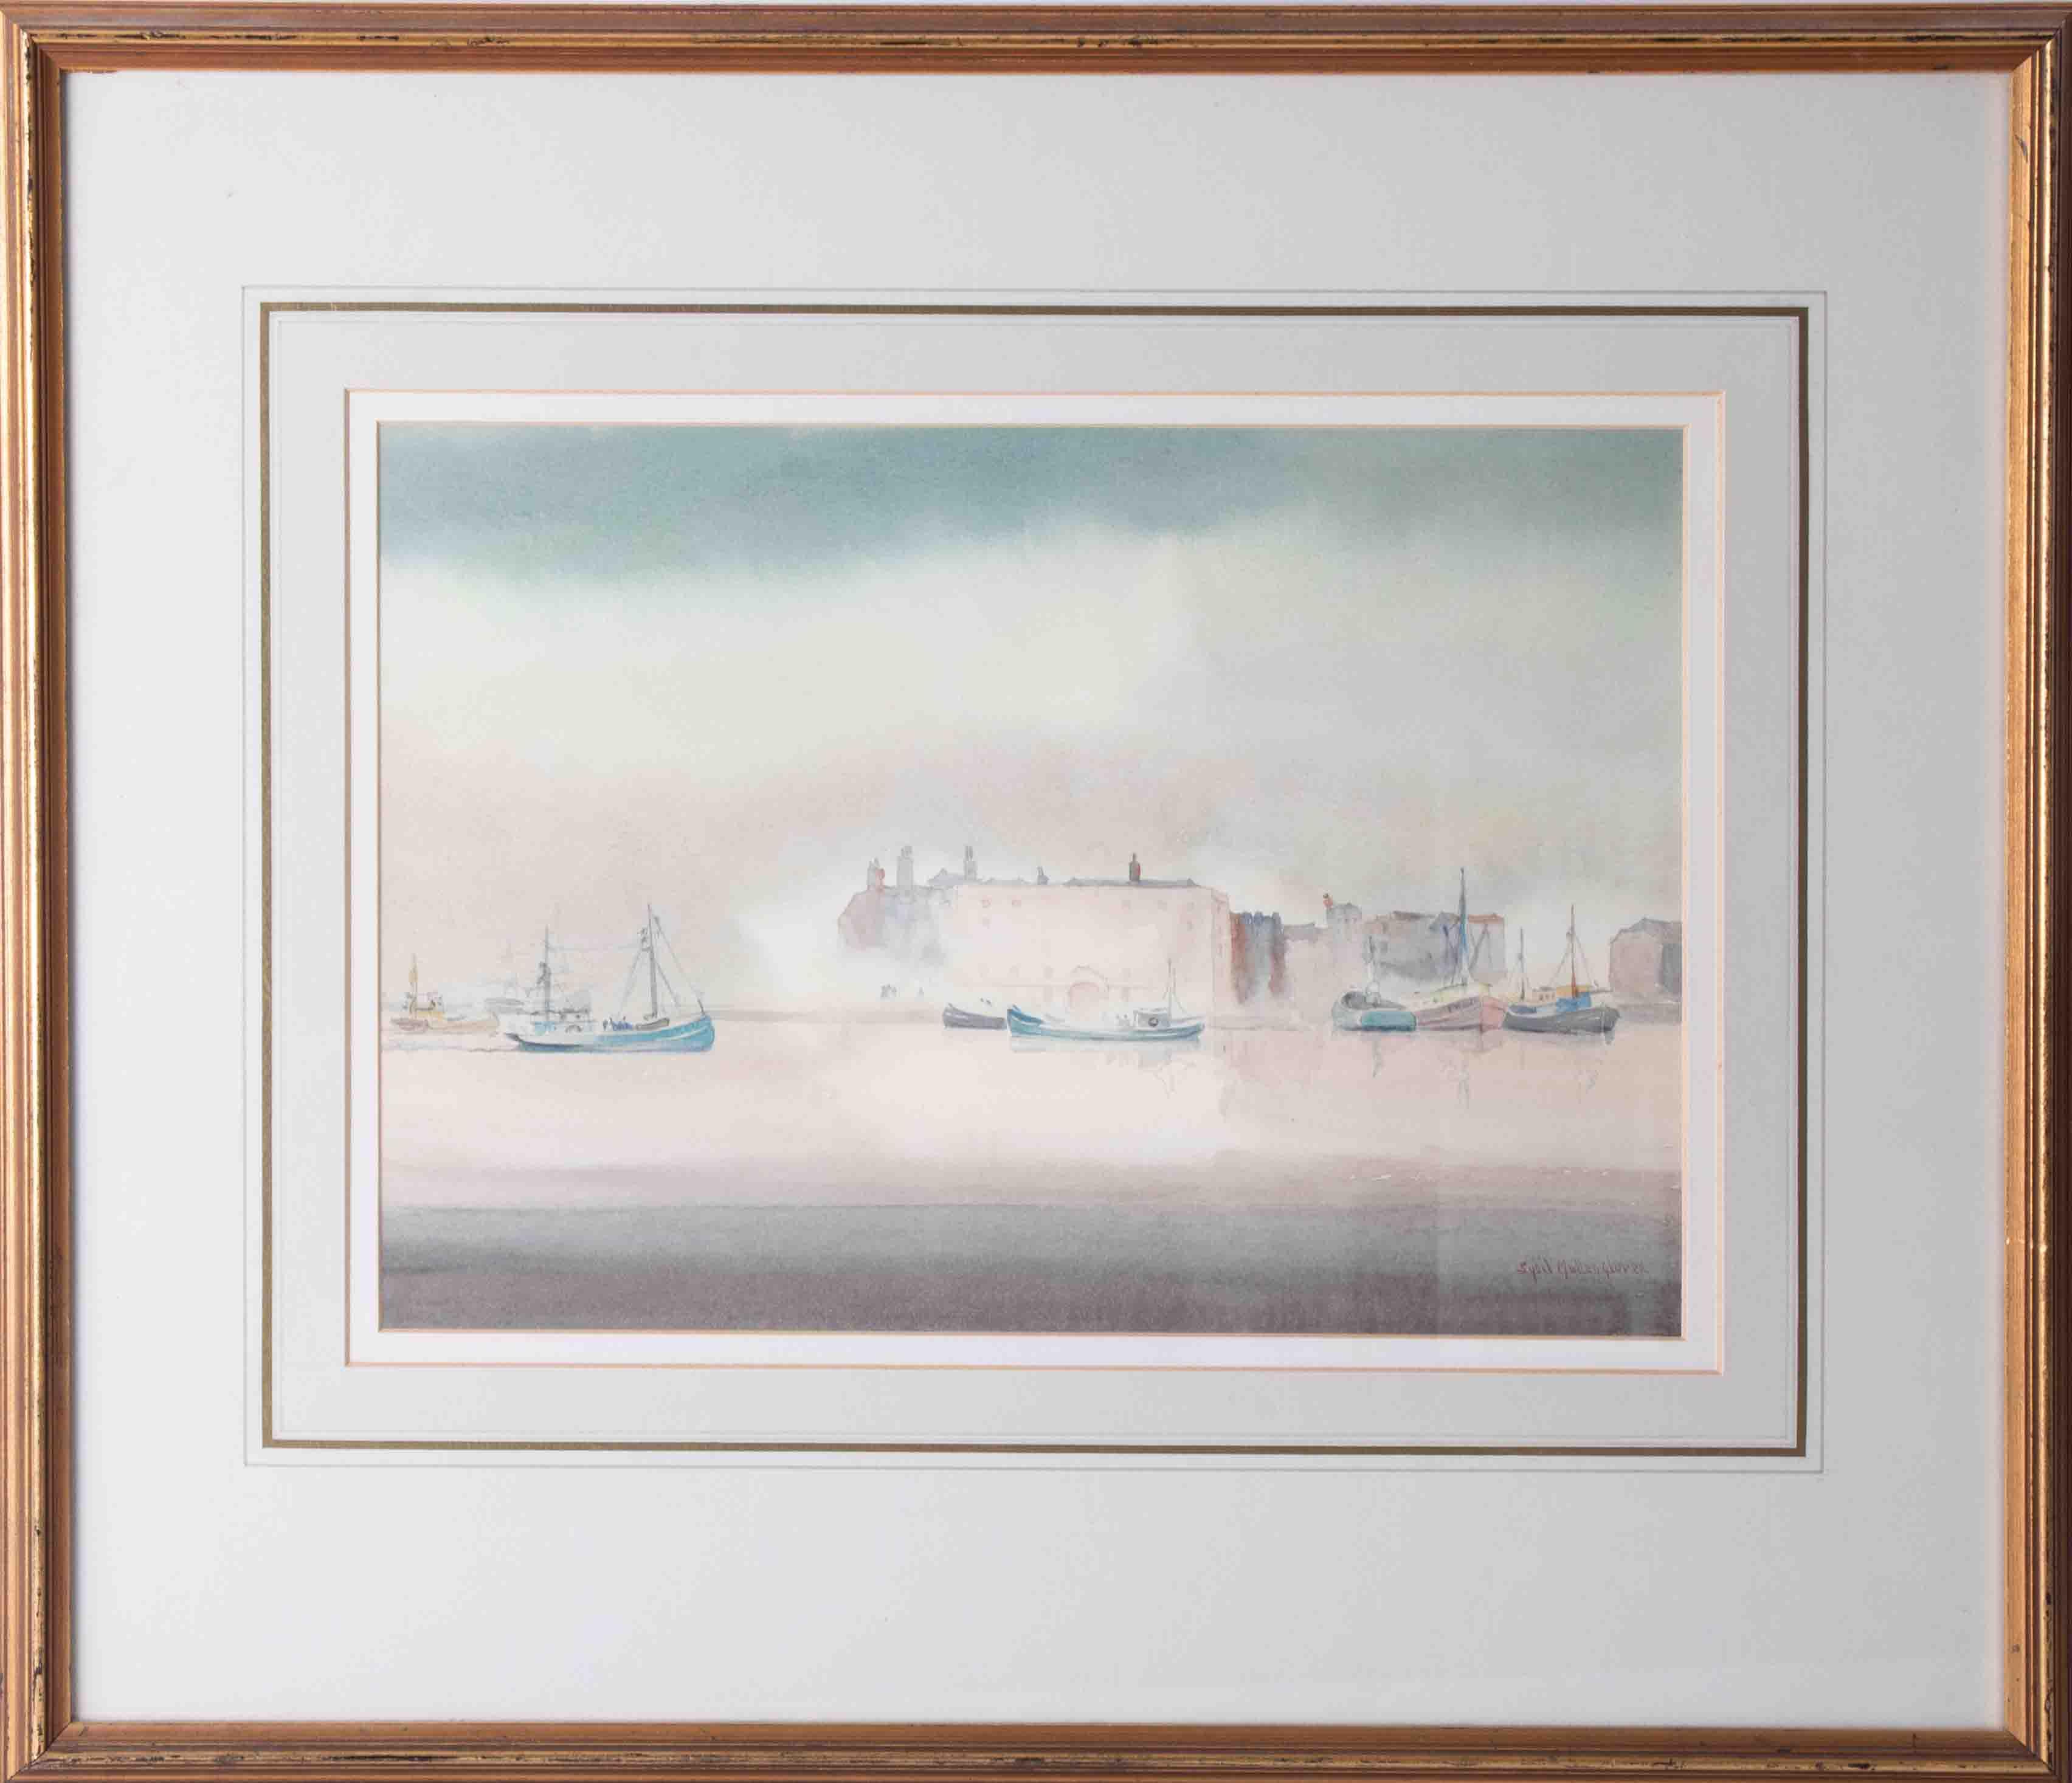 Sybil Mullen Glover RI RWA RSMA (1908-1995), 'Boats, Plymouth' signed watercolour, 25cm x 35cm,